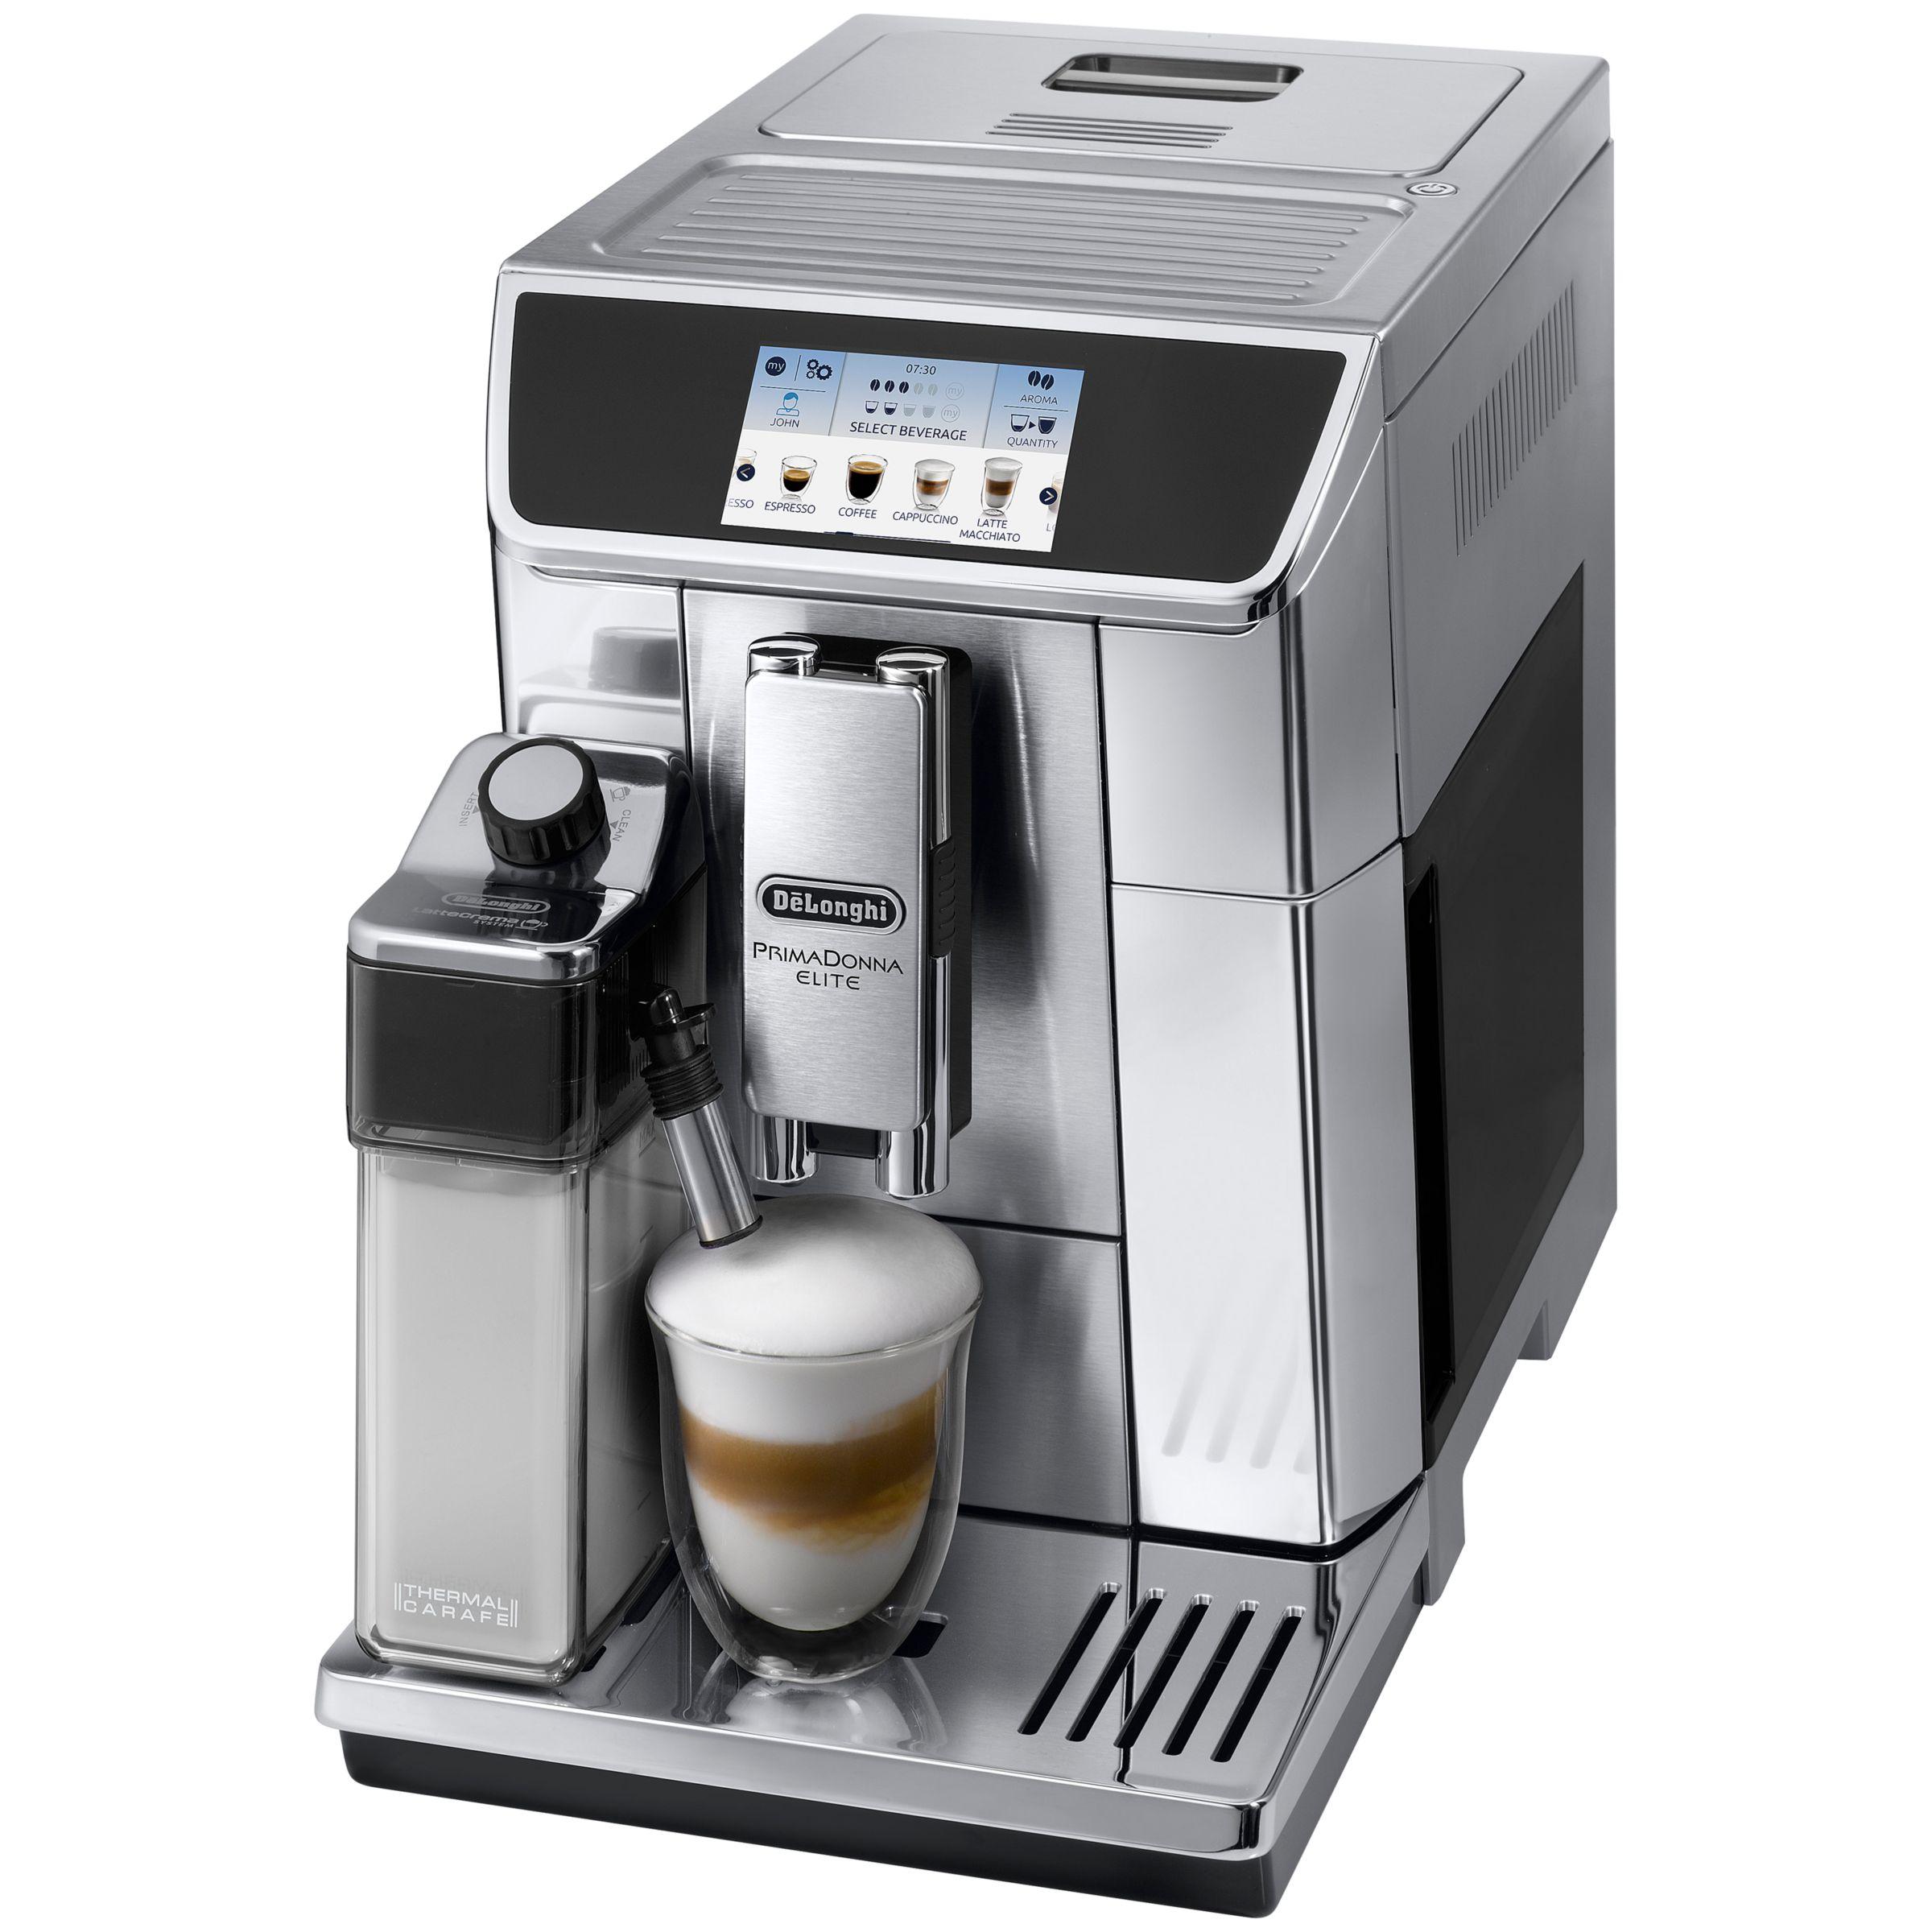 Electronic Prima Donna Delonghi Coffee Machine buy delonghi ecam650 75 primadonna elite bean to cup coffee machine